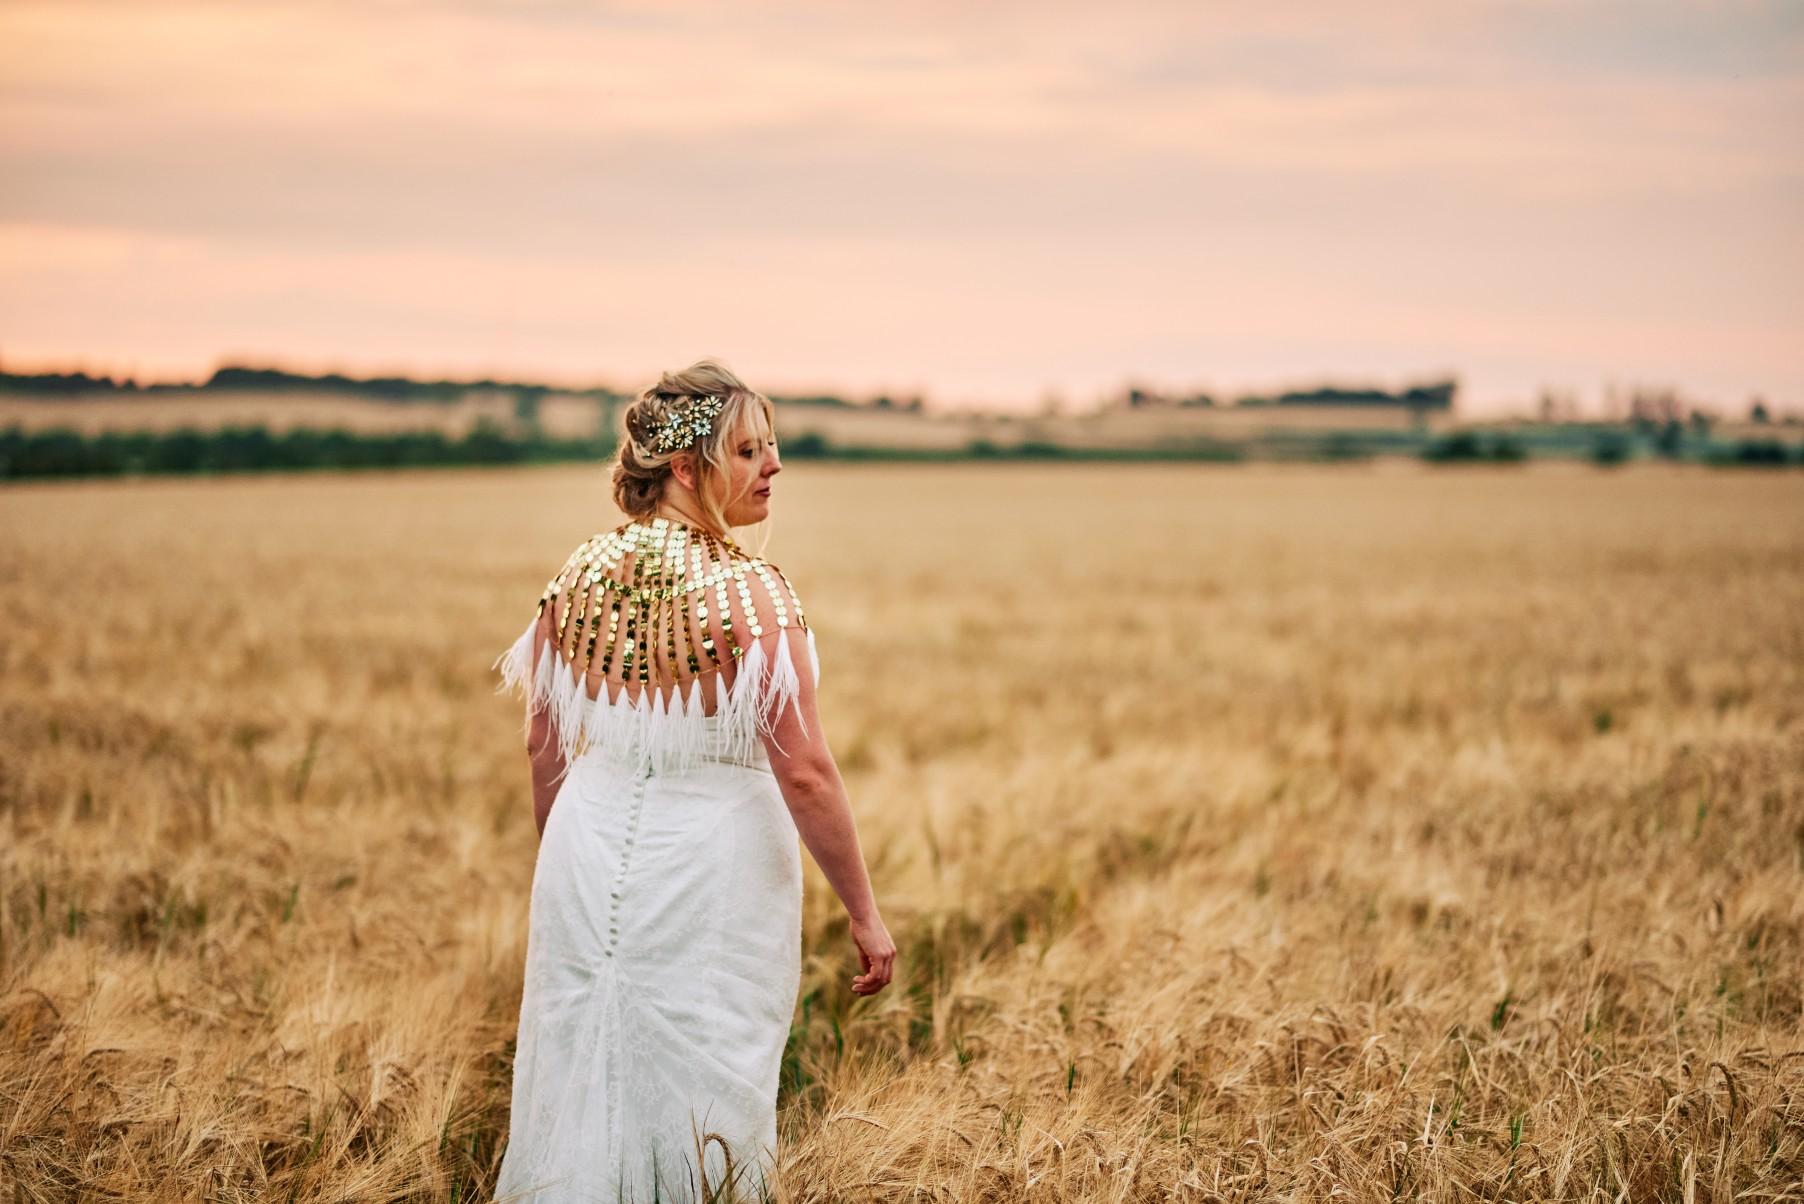 nhs wedding - paramedic wedding - blue and gold wedding - outdoor wedding - micro wedding - surprise wedding - festival bride